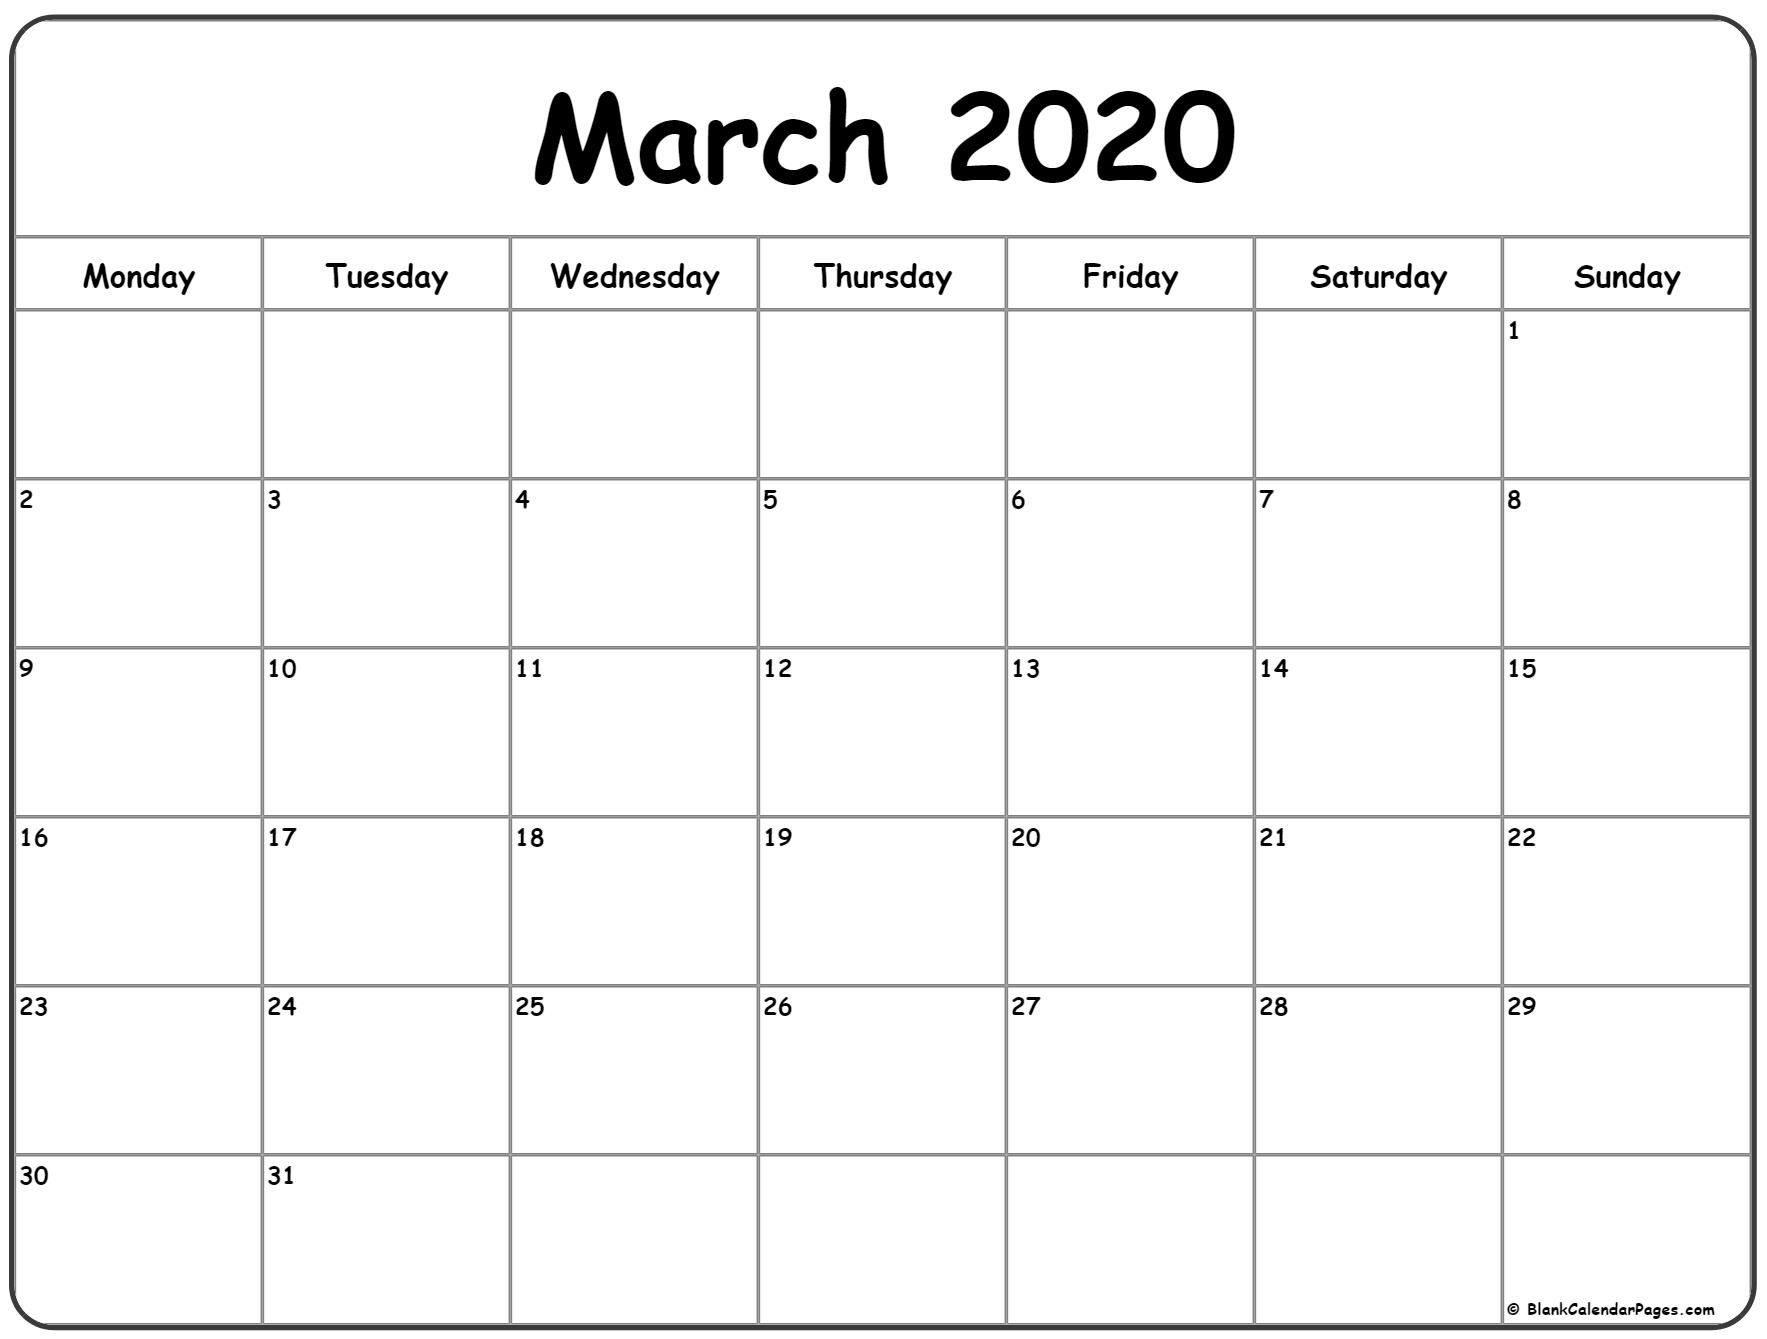 March 2020 Monday Calendar | Monday To Sunday | August-2020 Calendar Templates Monday - Friday